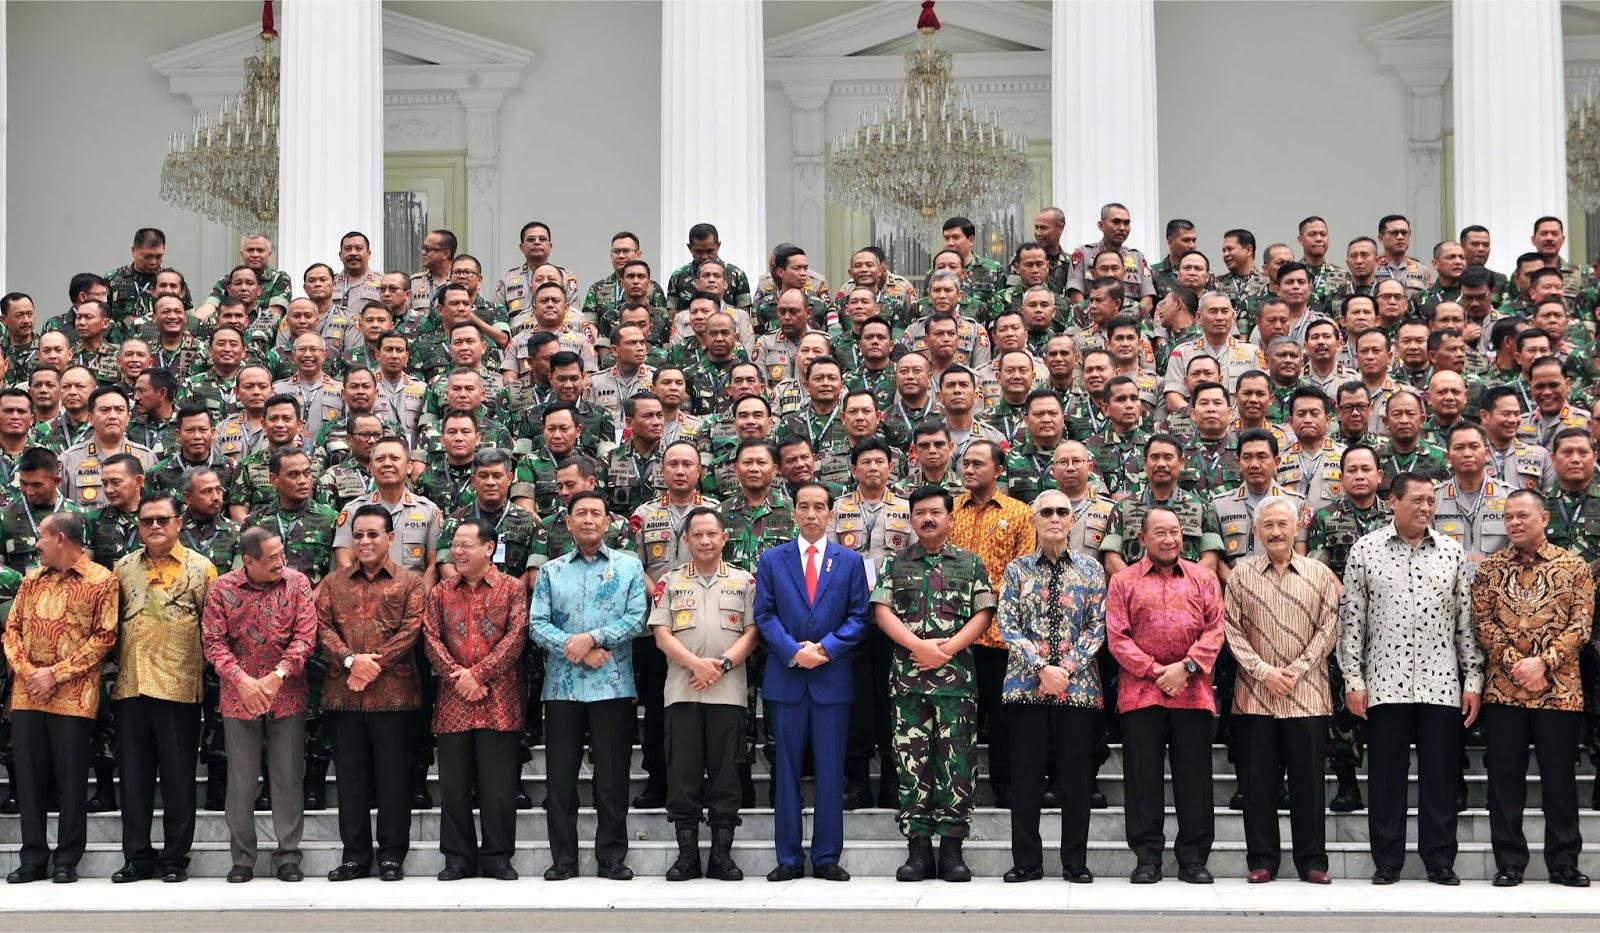 Buka Rapim TNI-Polri 2019, Presiden Jokowi: Dunia Berubah, Kita Harus Merespon Cepat